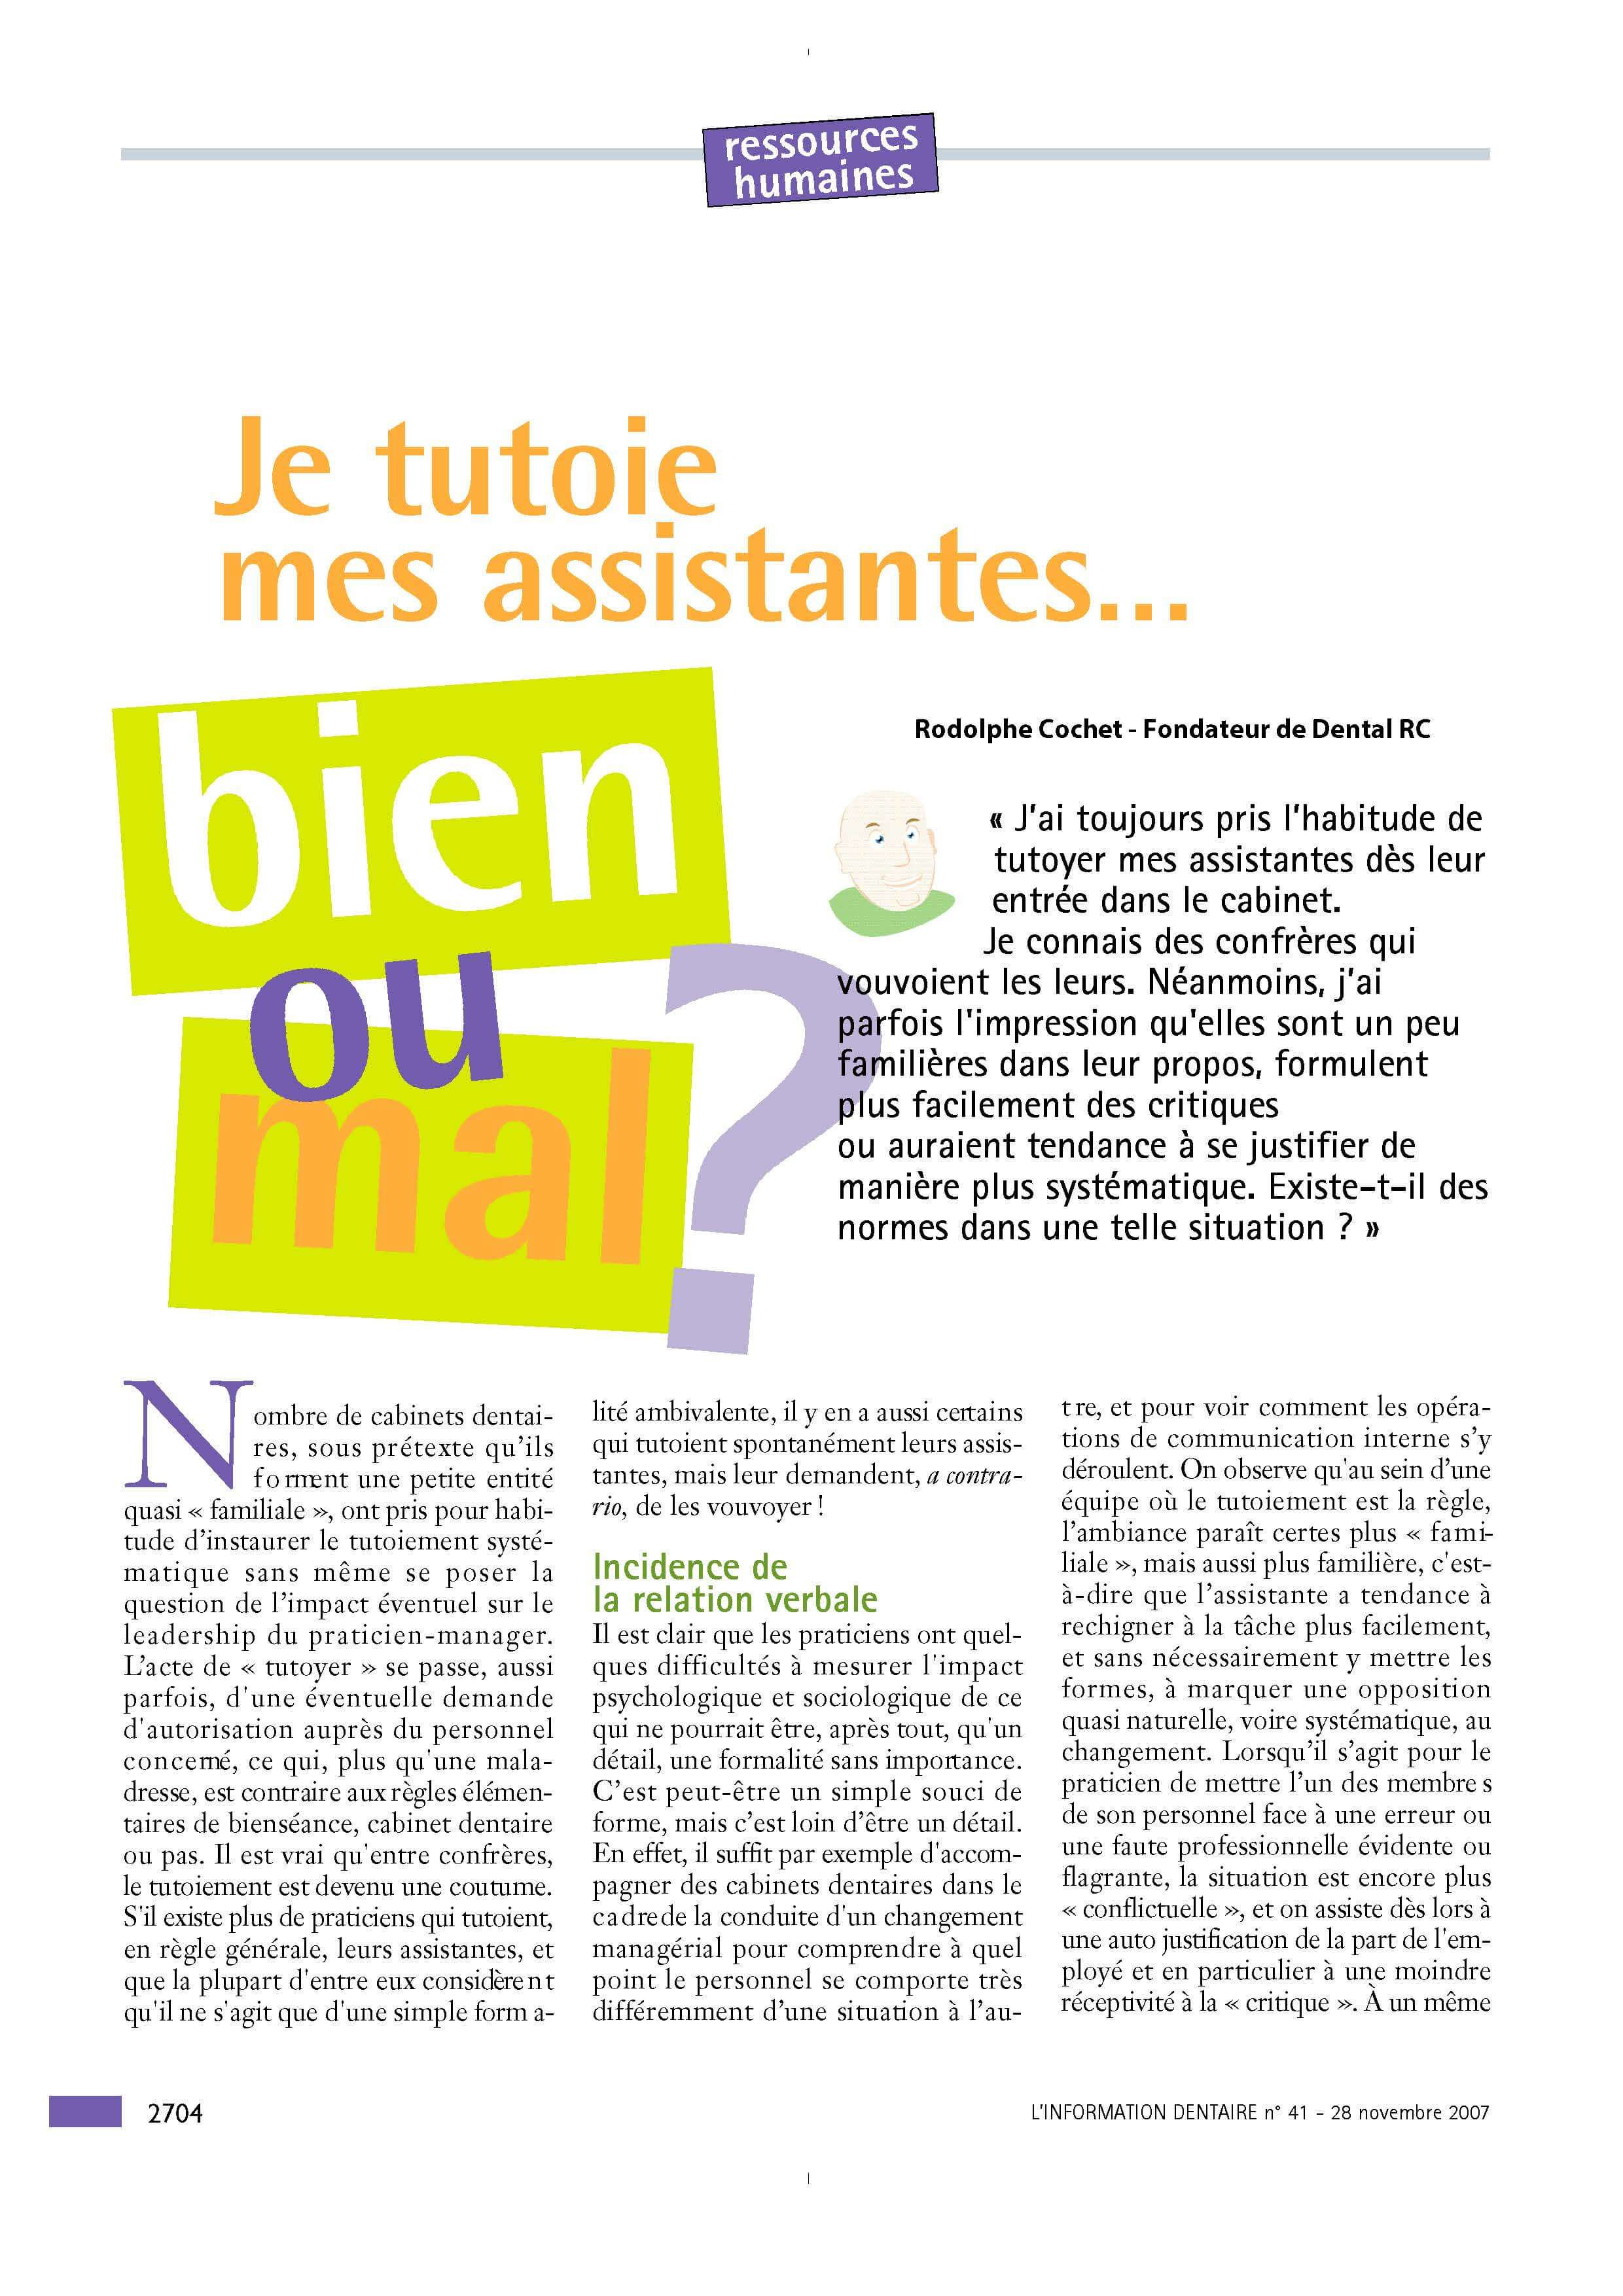 Information_Dentaire_Tutoyer_son_assistante_dentaire_bien_ou_mal.jpg